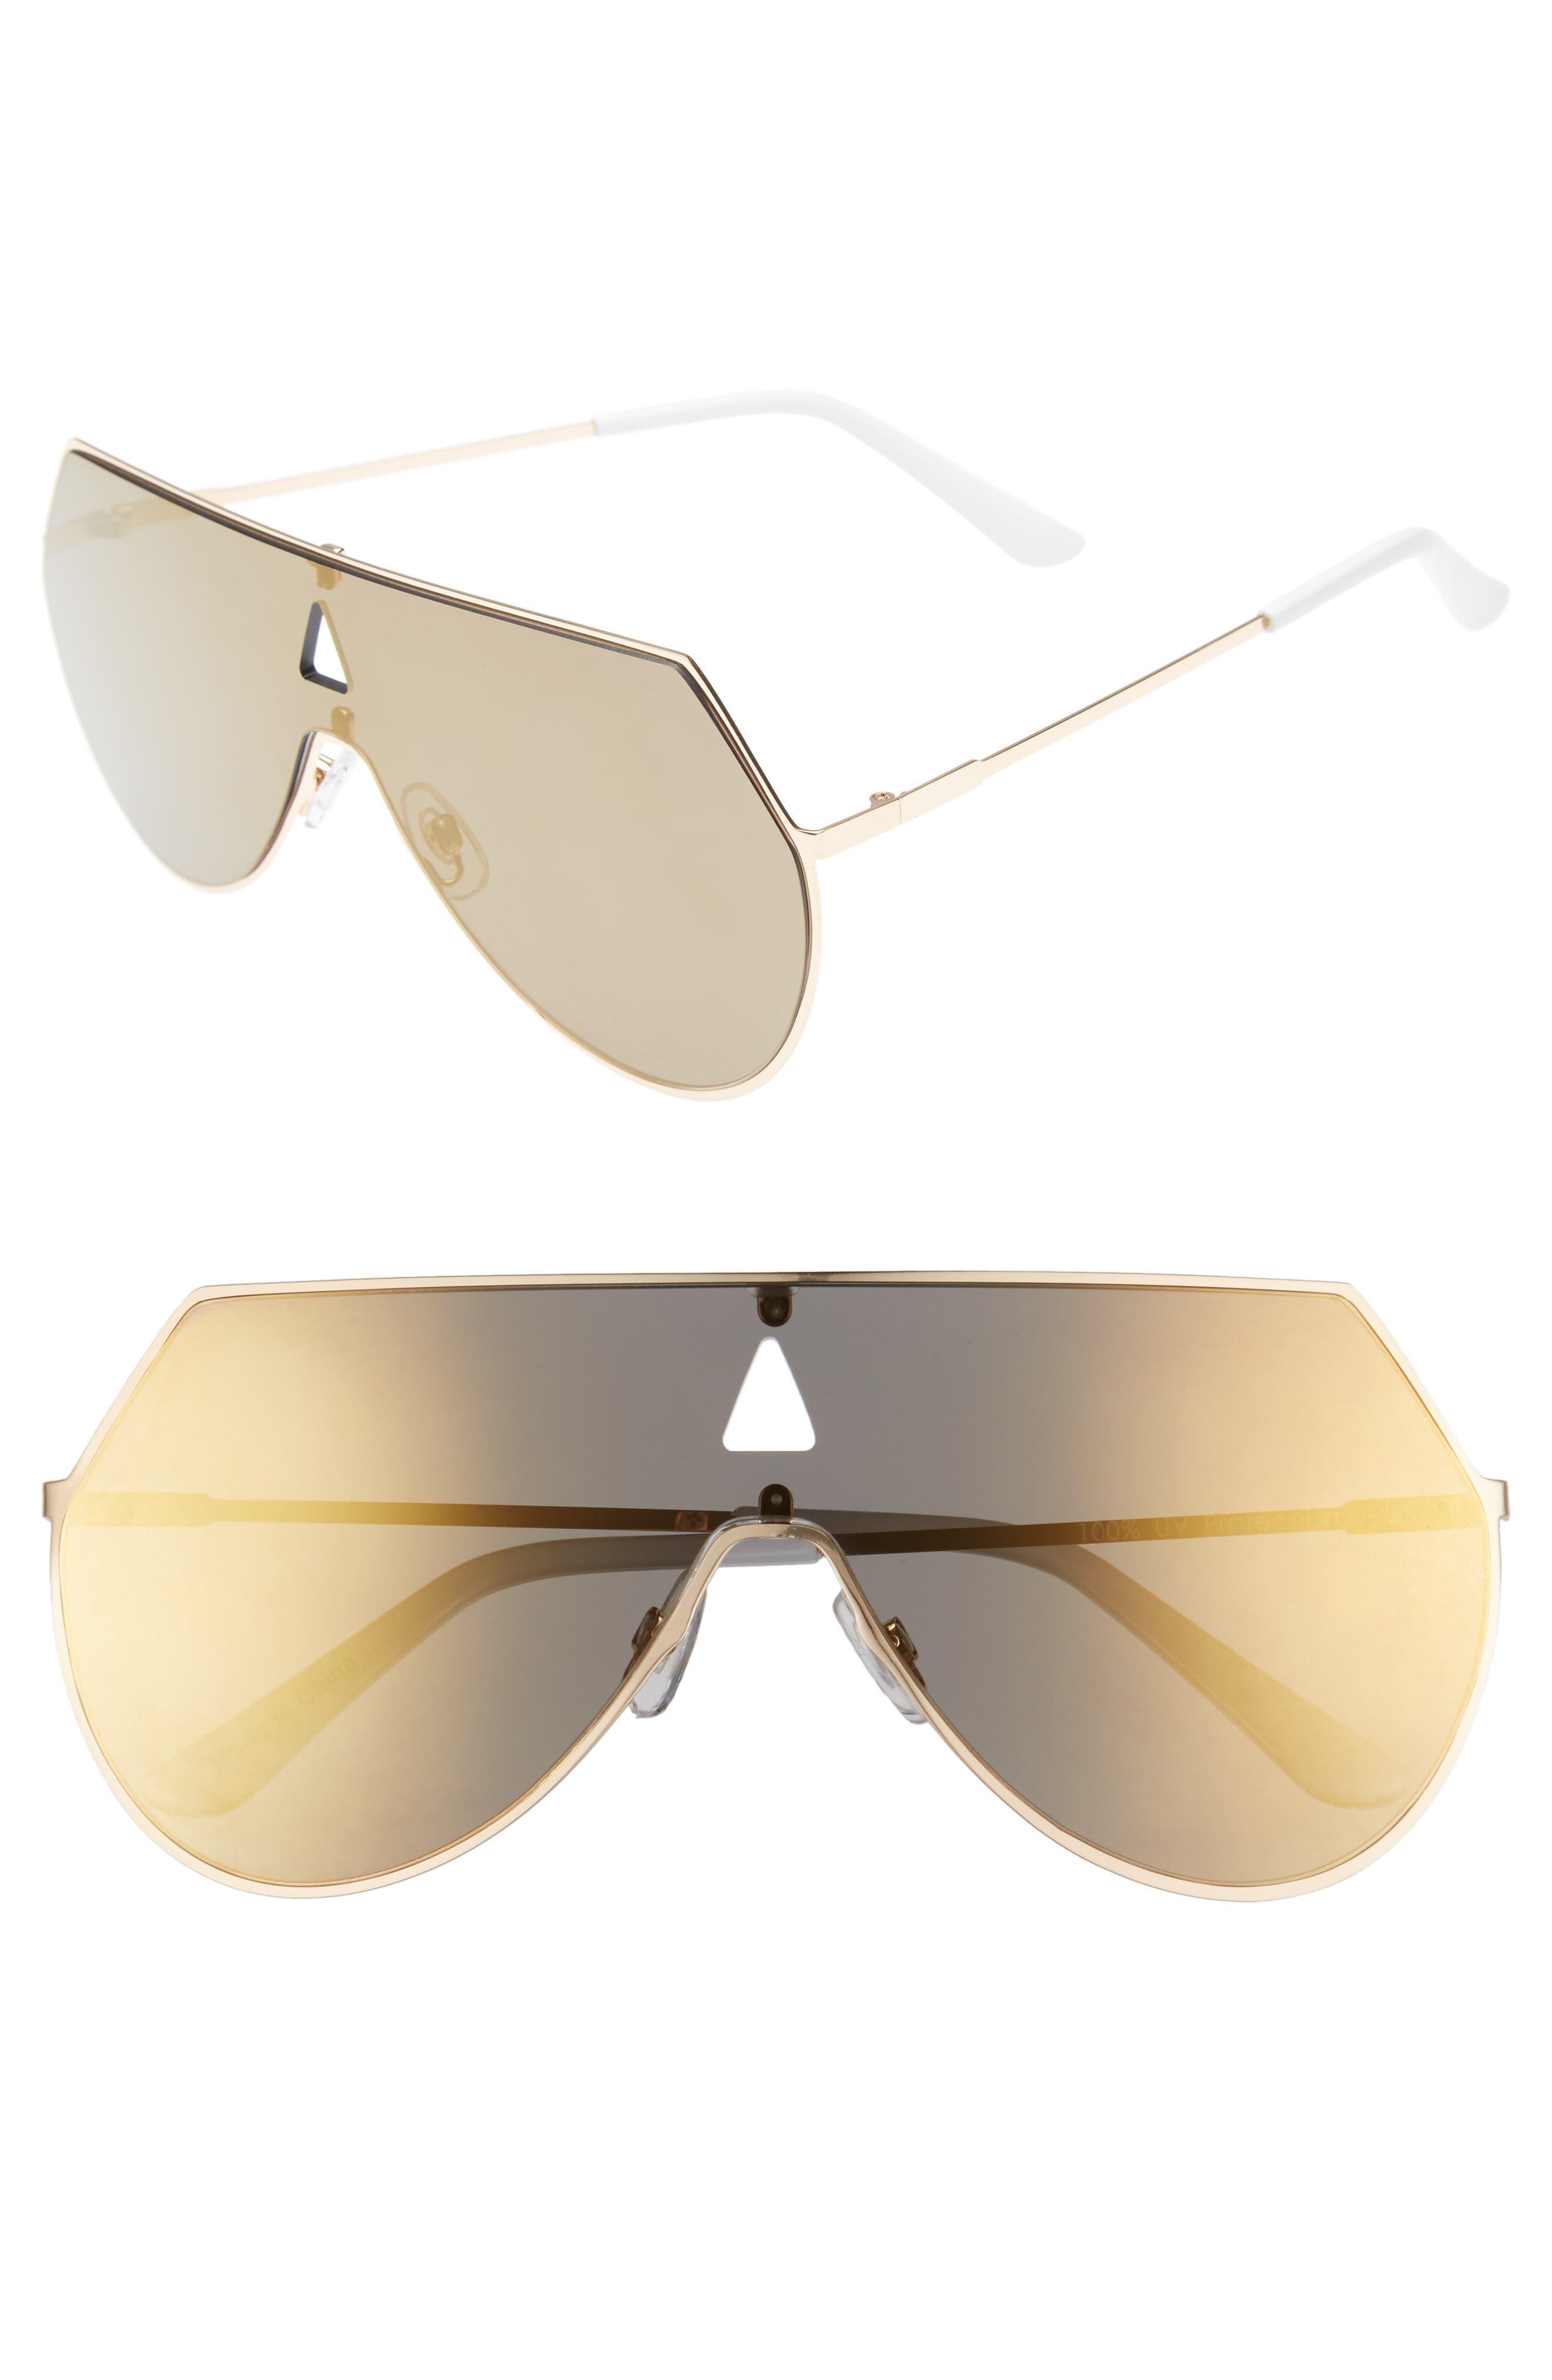 60mm Flat Lens Aviator Sunglasses,                         Main,                         color,